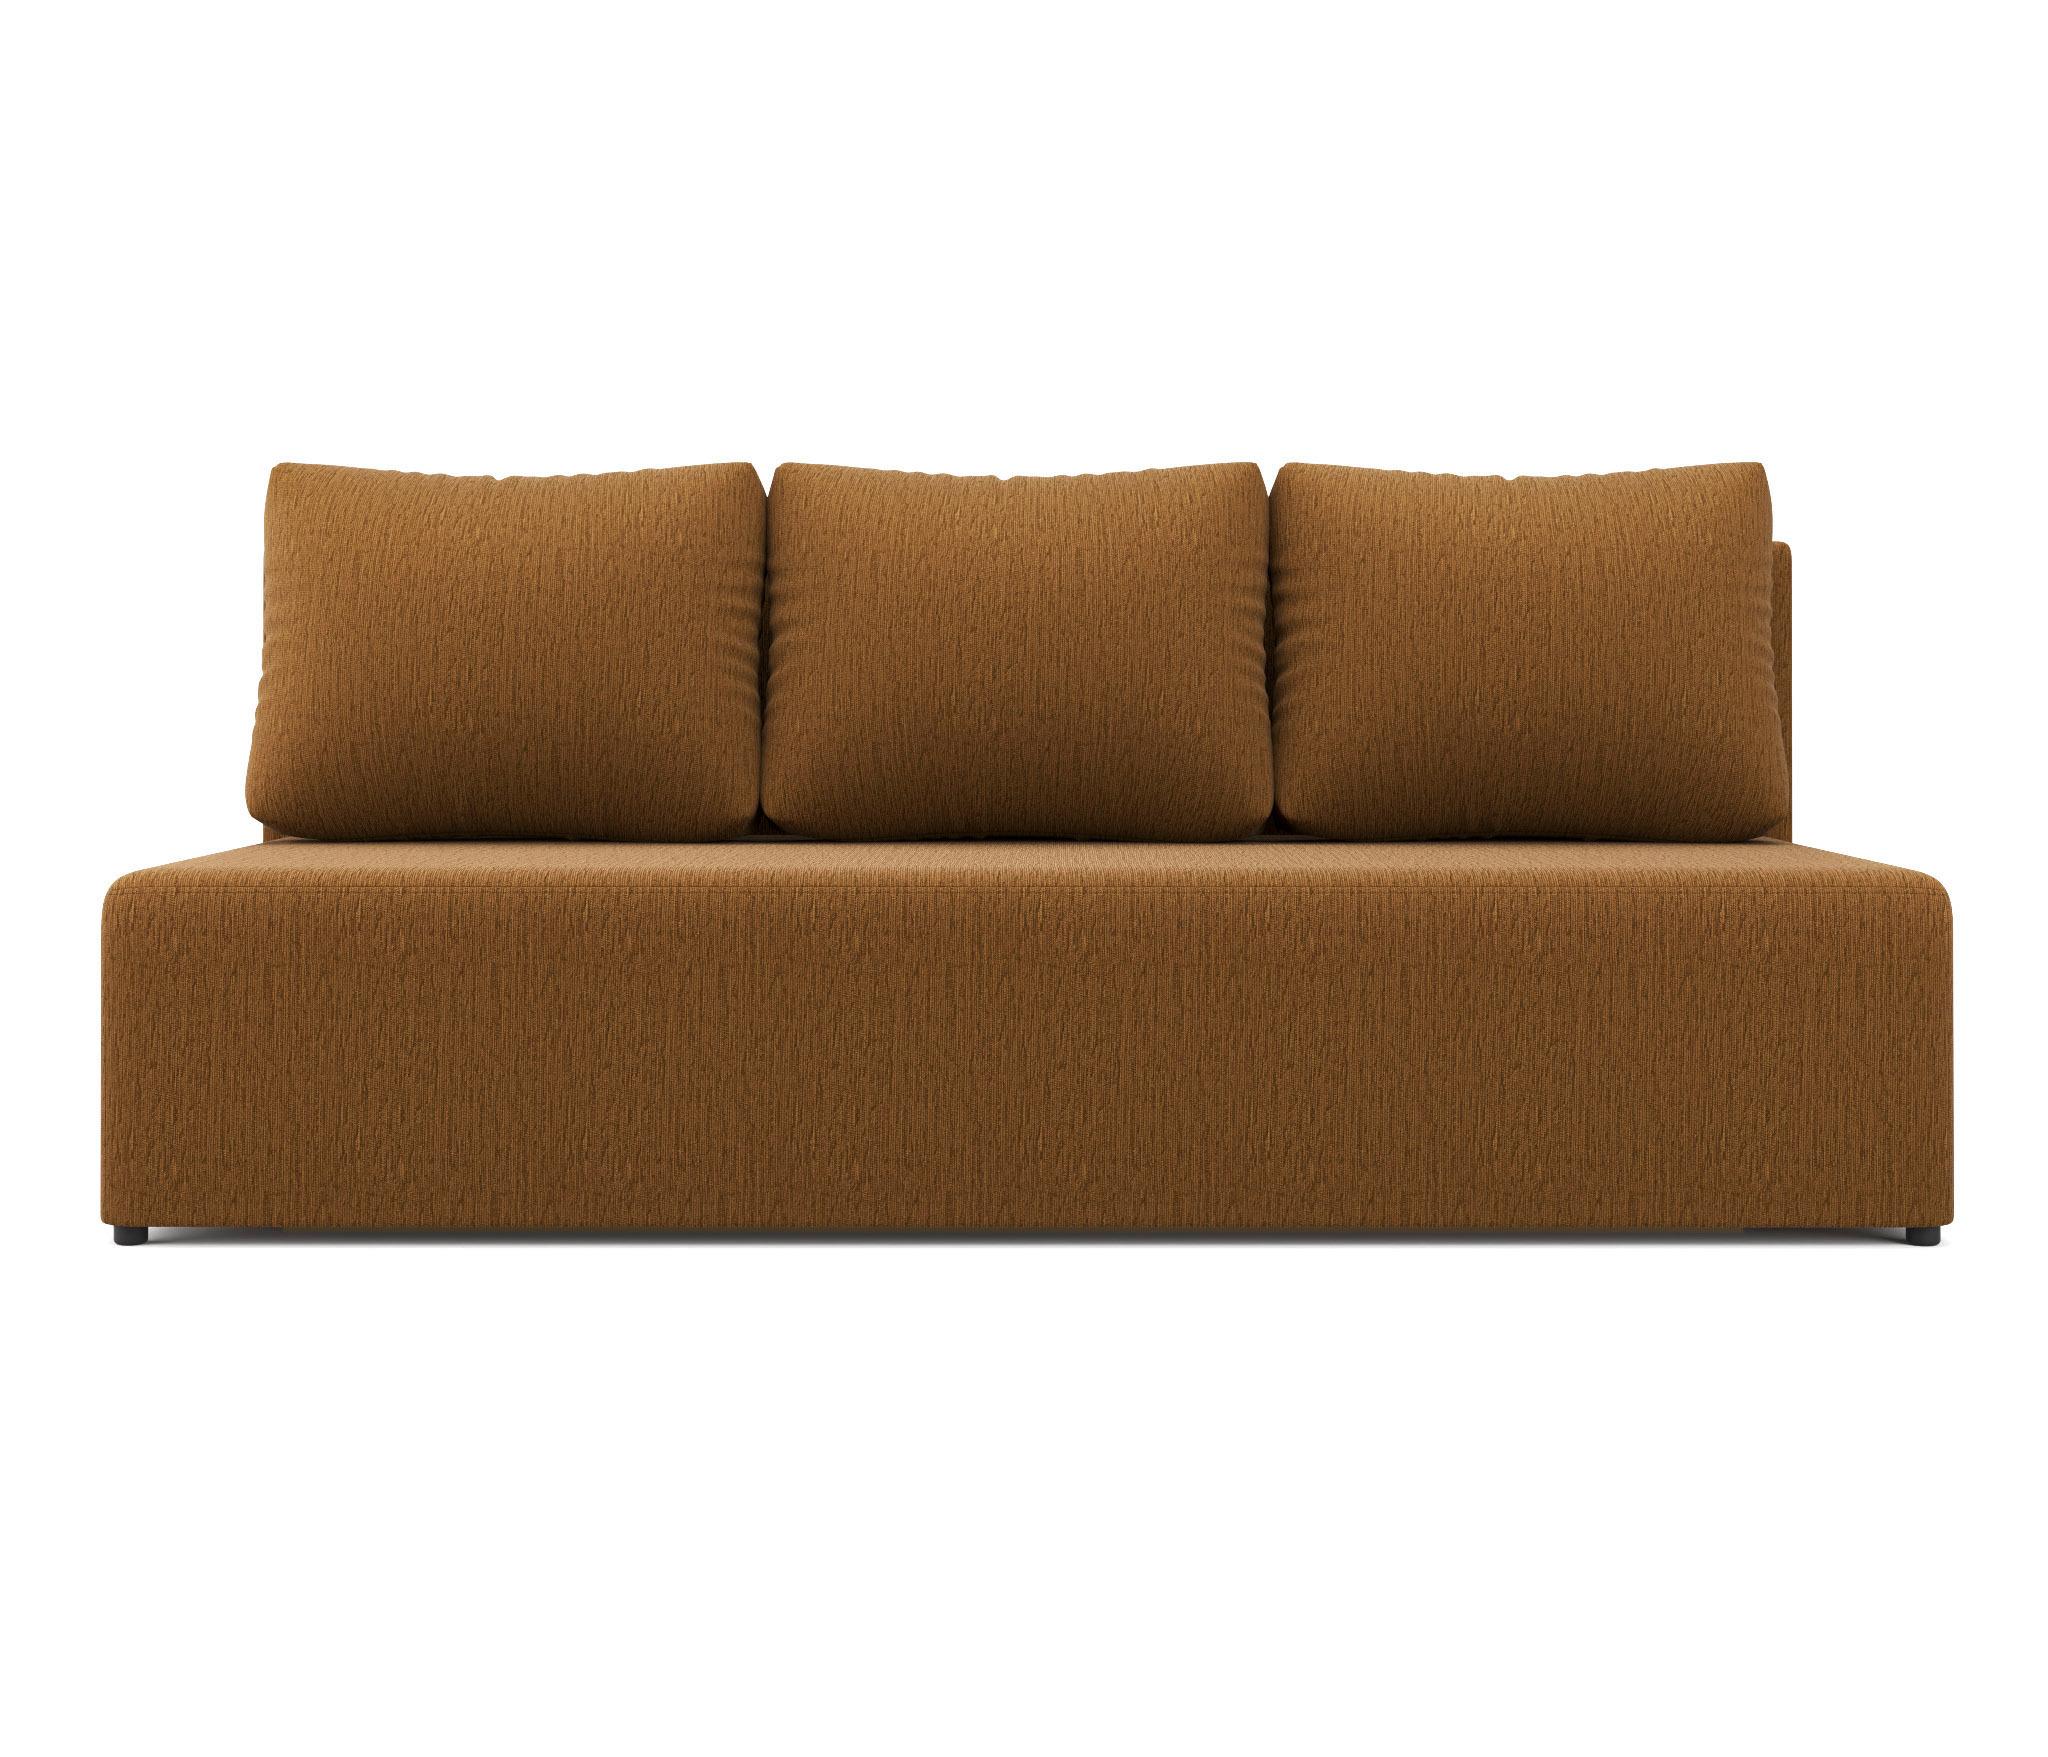 Нексус диван-кровать Malina BrownДиваны и кресла<br>Размер (ШхВхГ, см):185х73х80&#13;Размер спального места (ШхД, см):130х185&#13;]]&gt;<br><br>Длина мм: 1850<br>Высота мм: 730<br>Глубина мм: 800